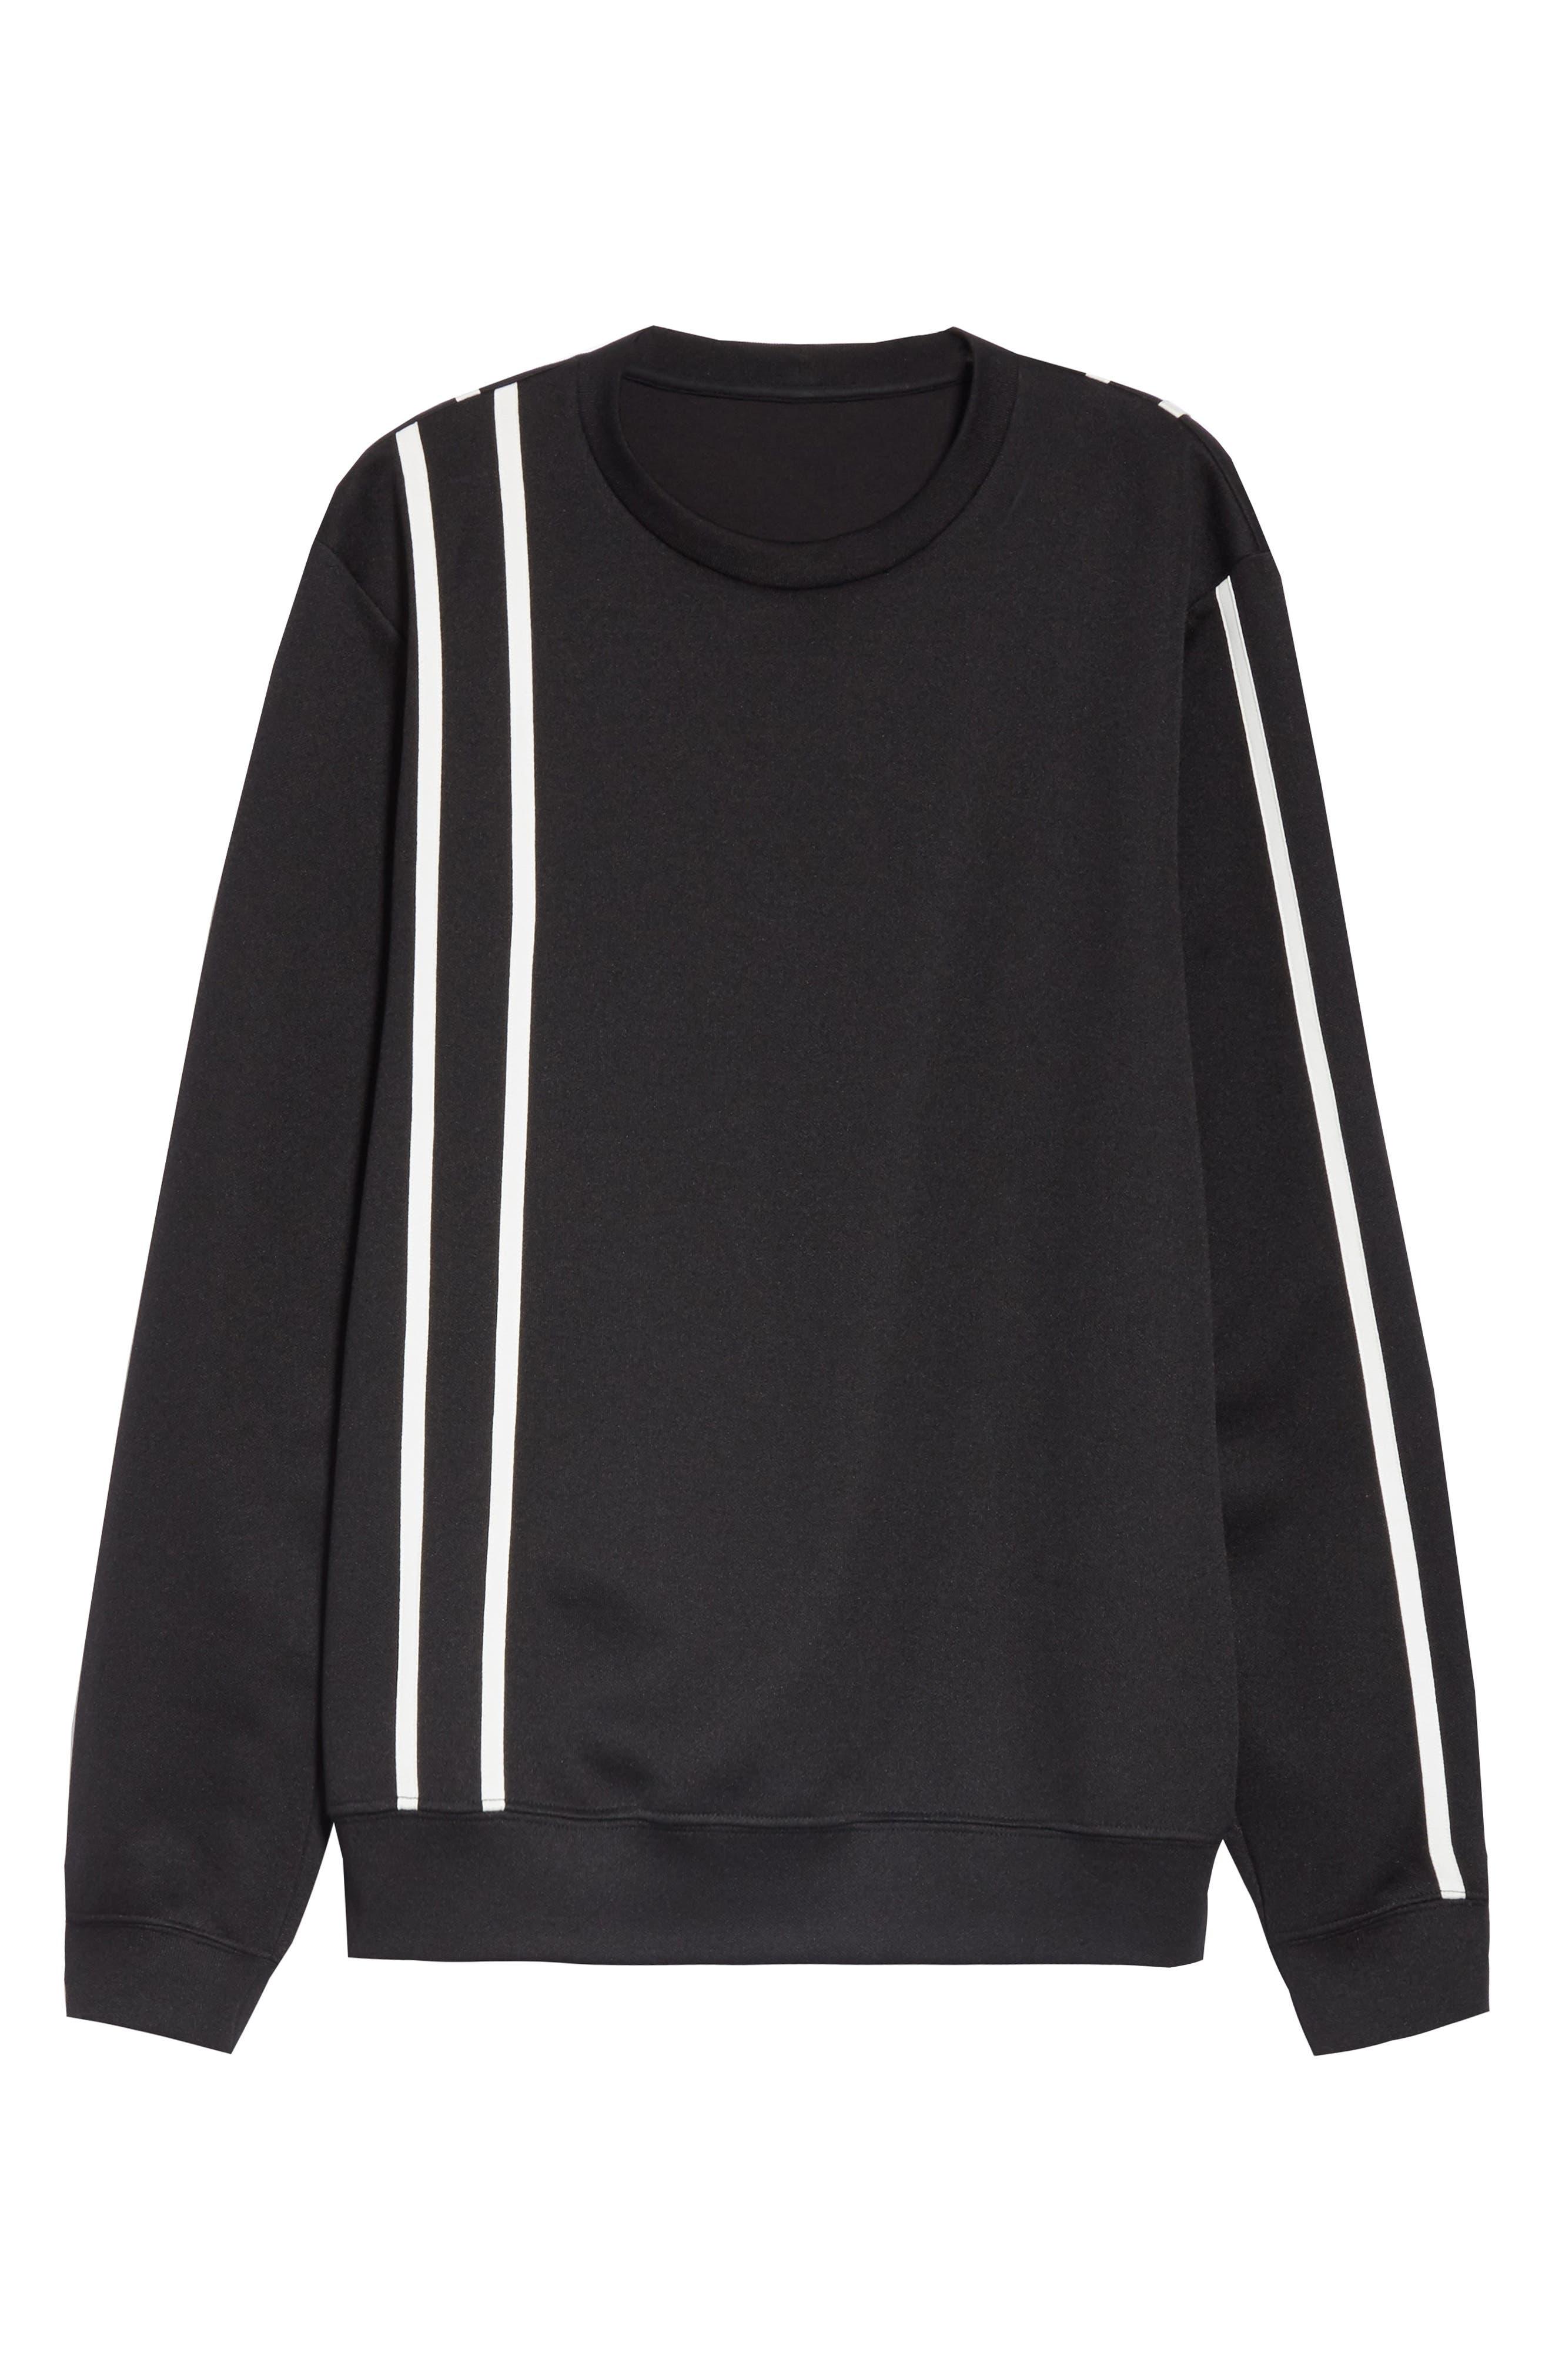 HELMUT LANG, Sport Stripe Print Sweatshirt, Alternate thumbnail 6, color, BLACK AND WHITE